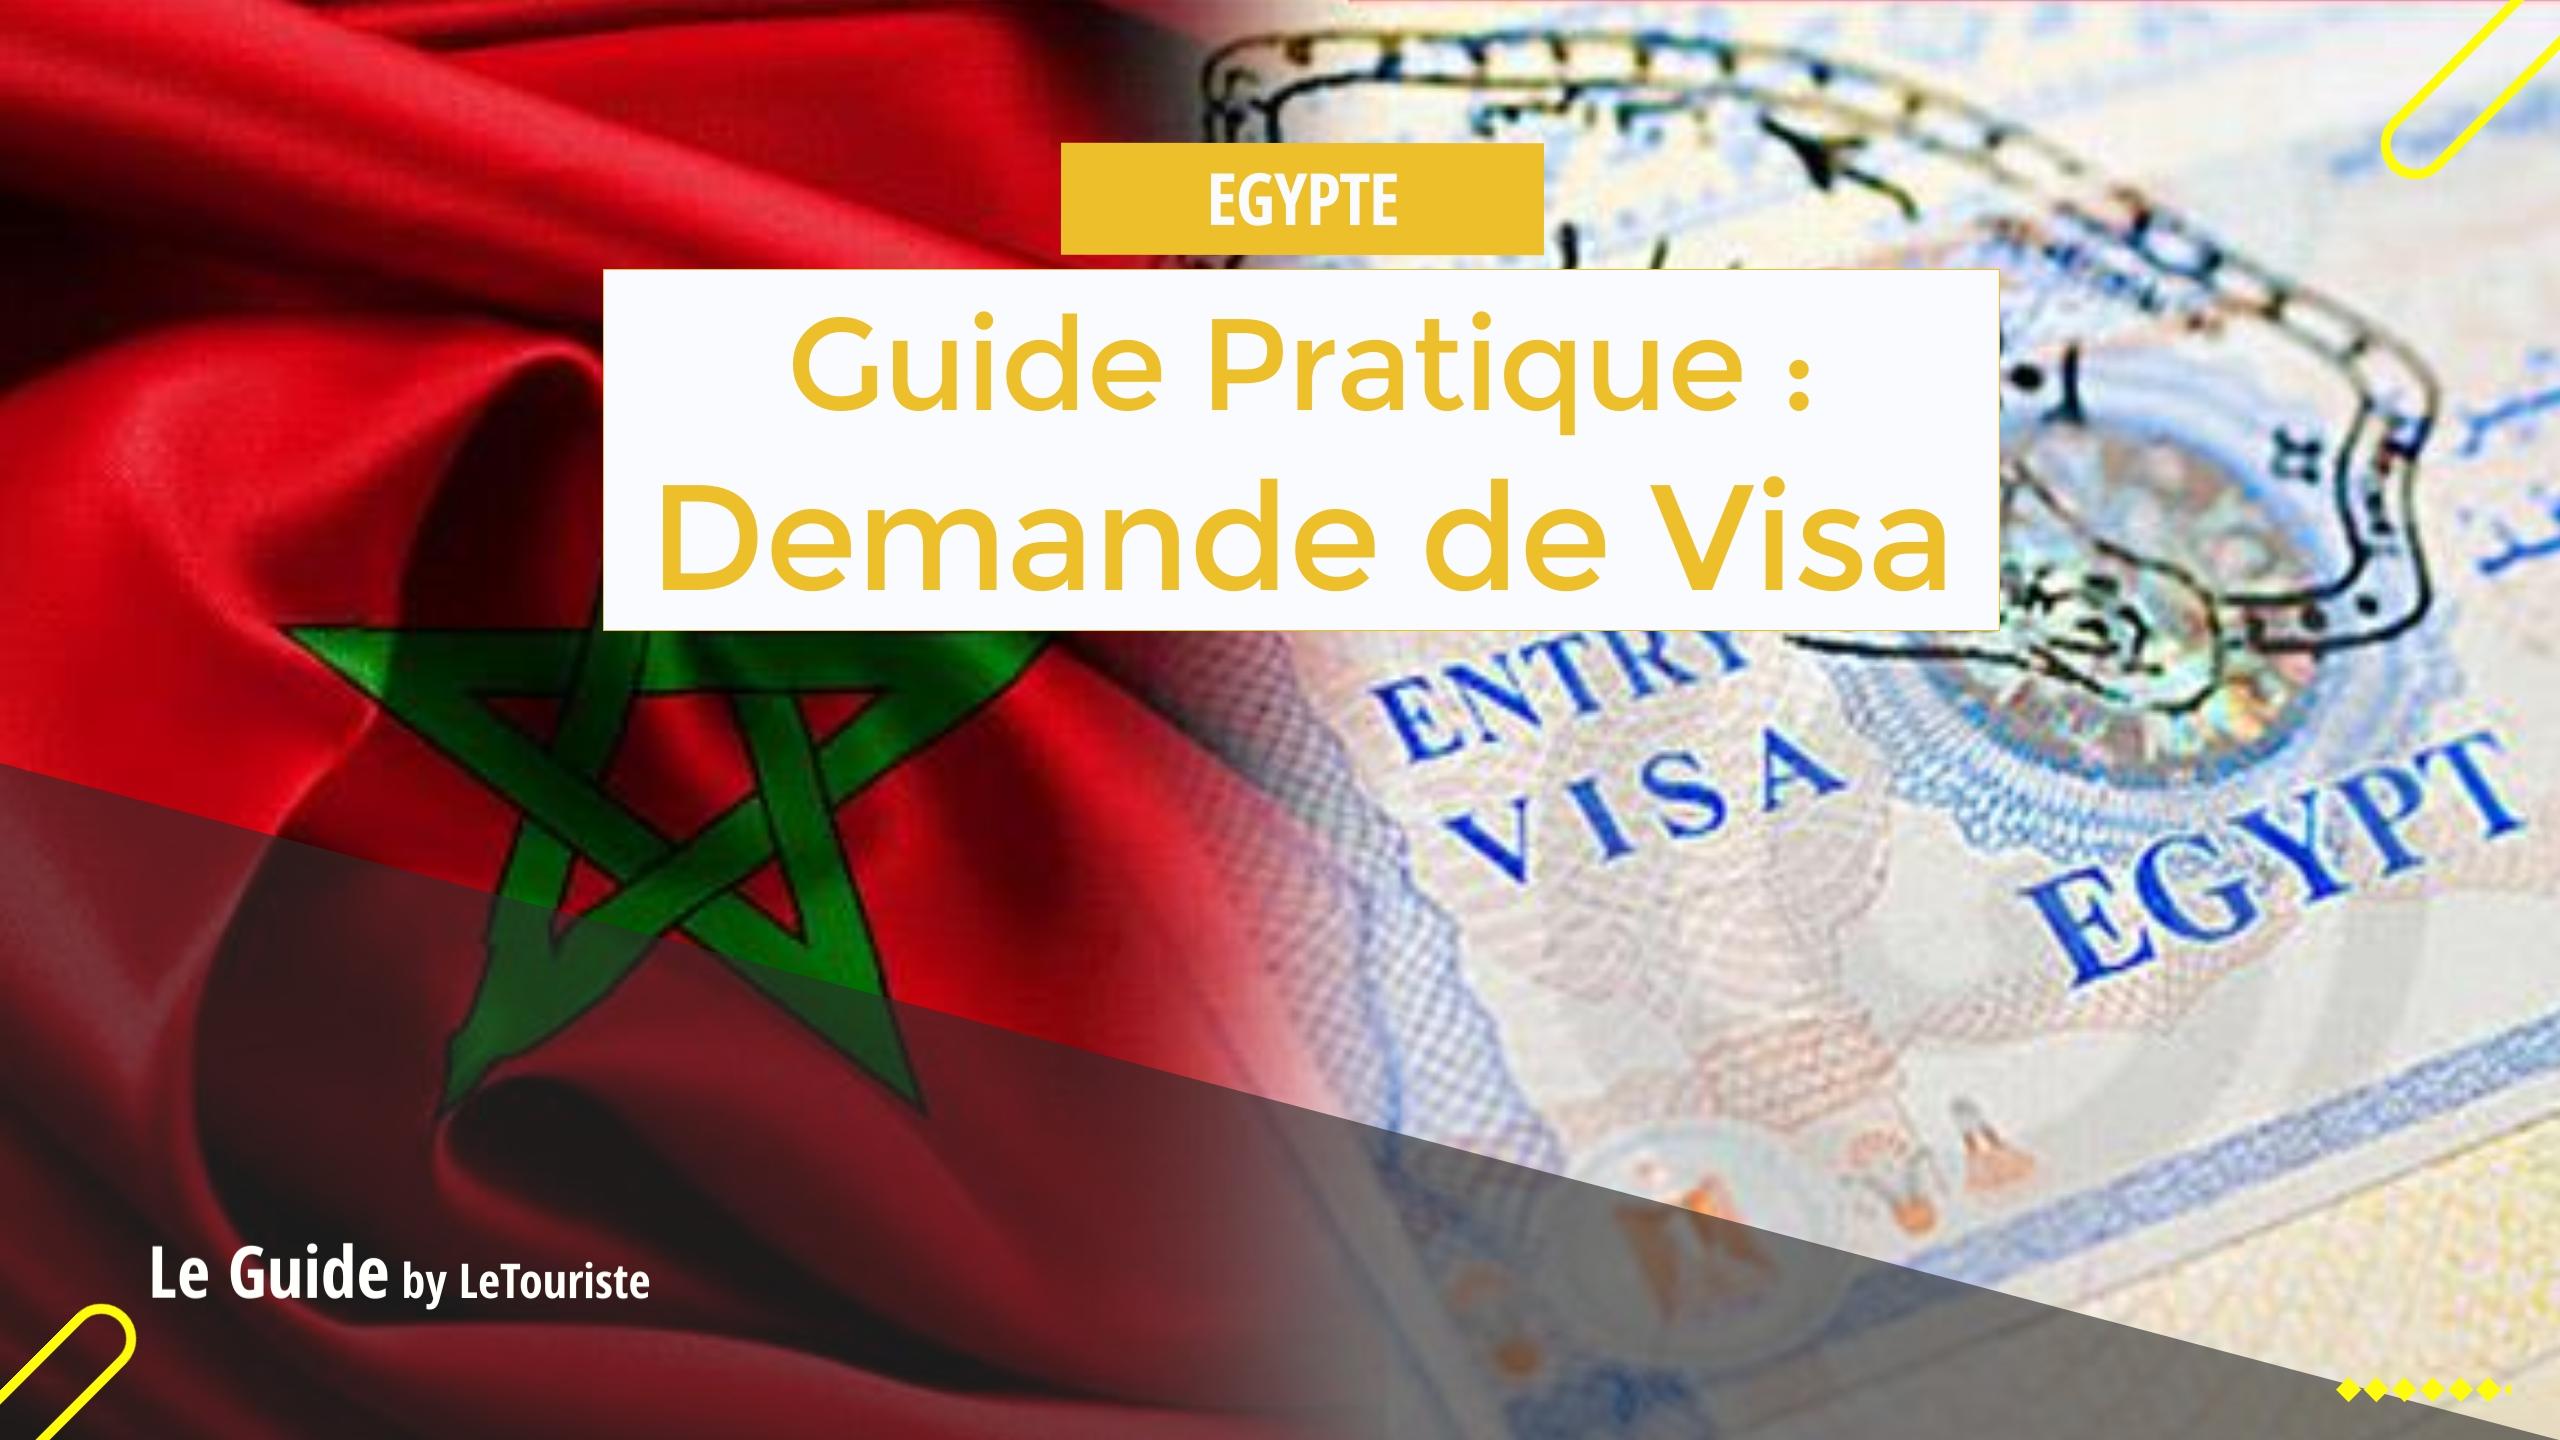 Guide Pratique Demande De Visa D Egypte